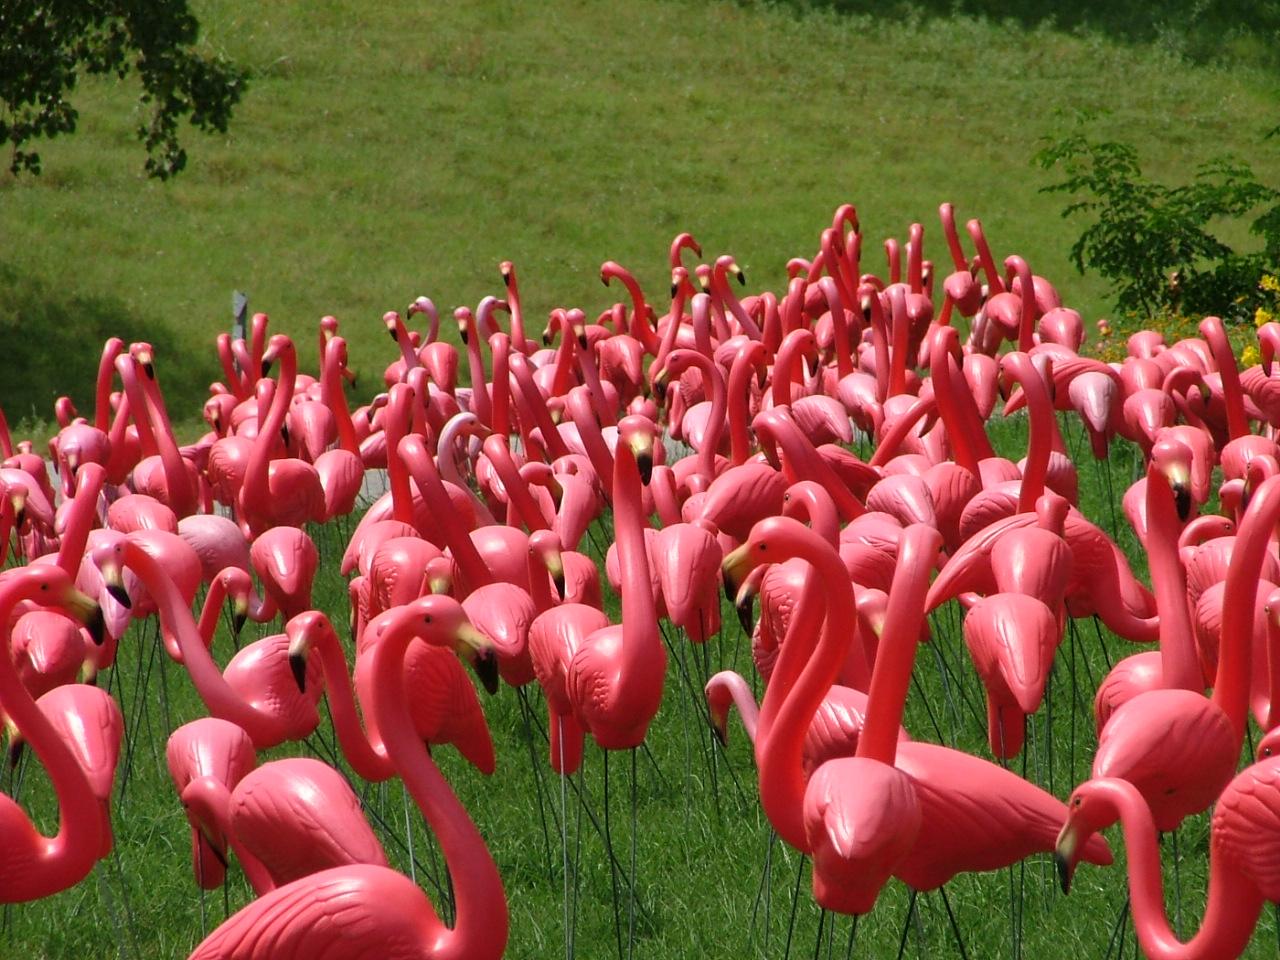 flamingo-1526694.jpg